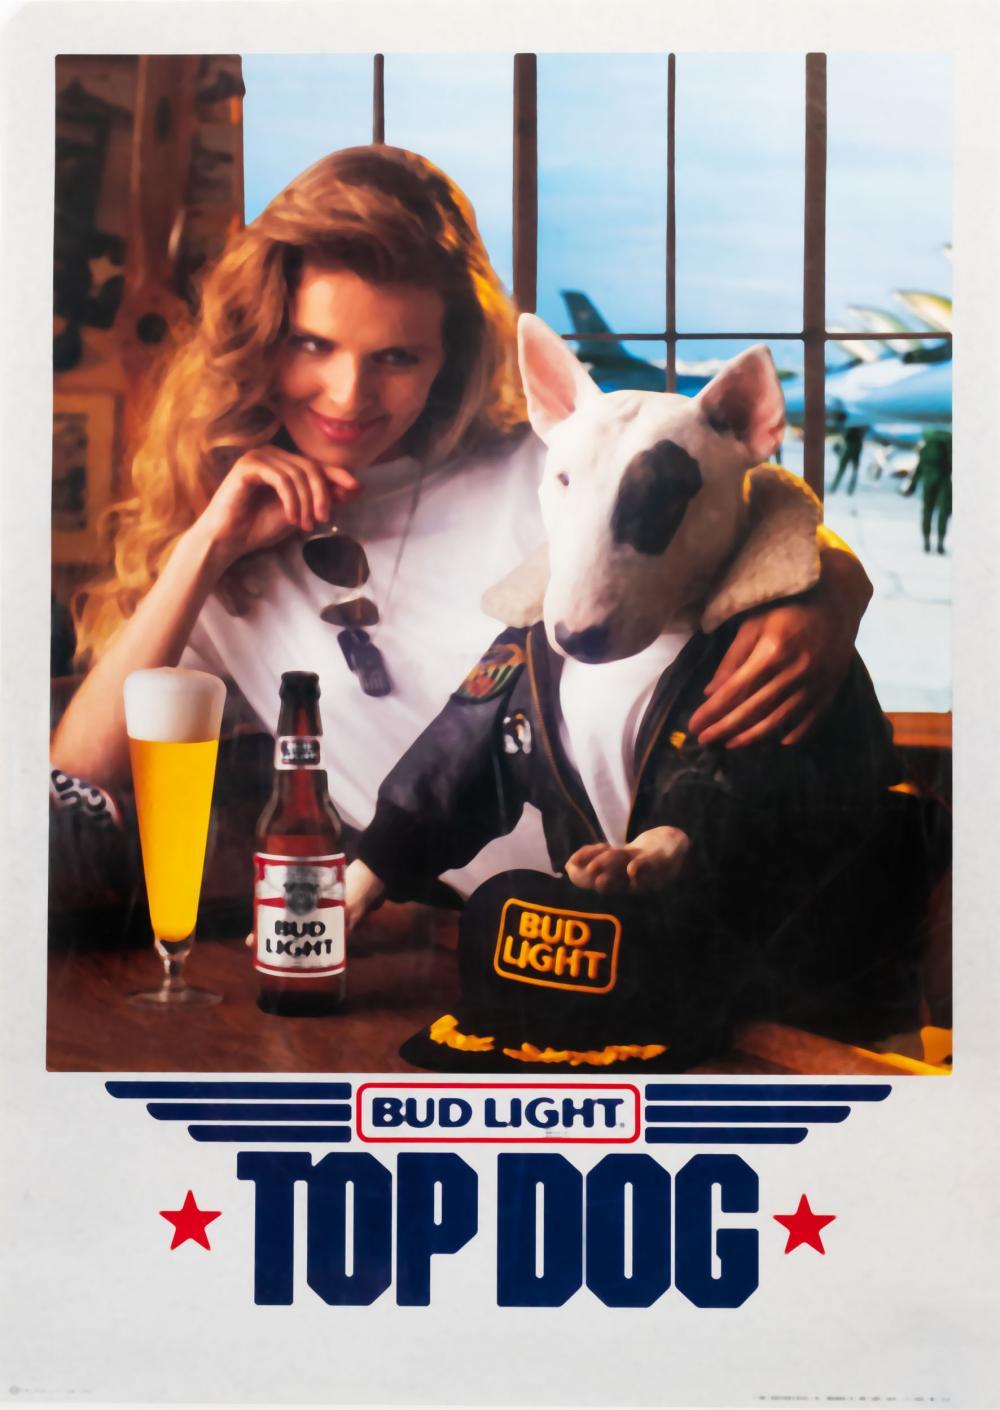 bud light top dog spuds mckenzie poster